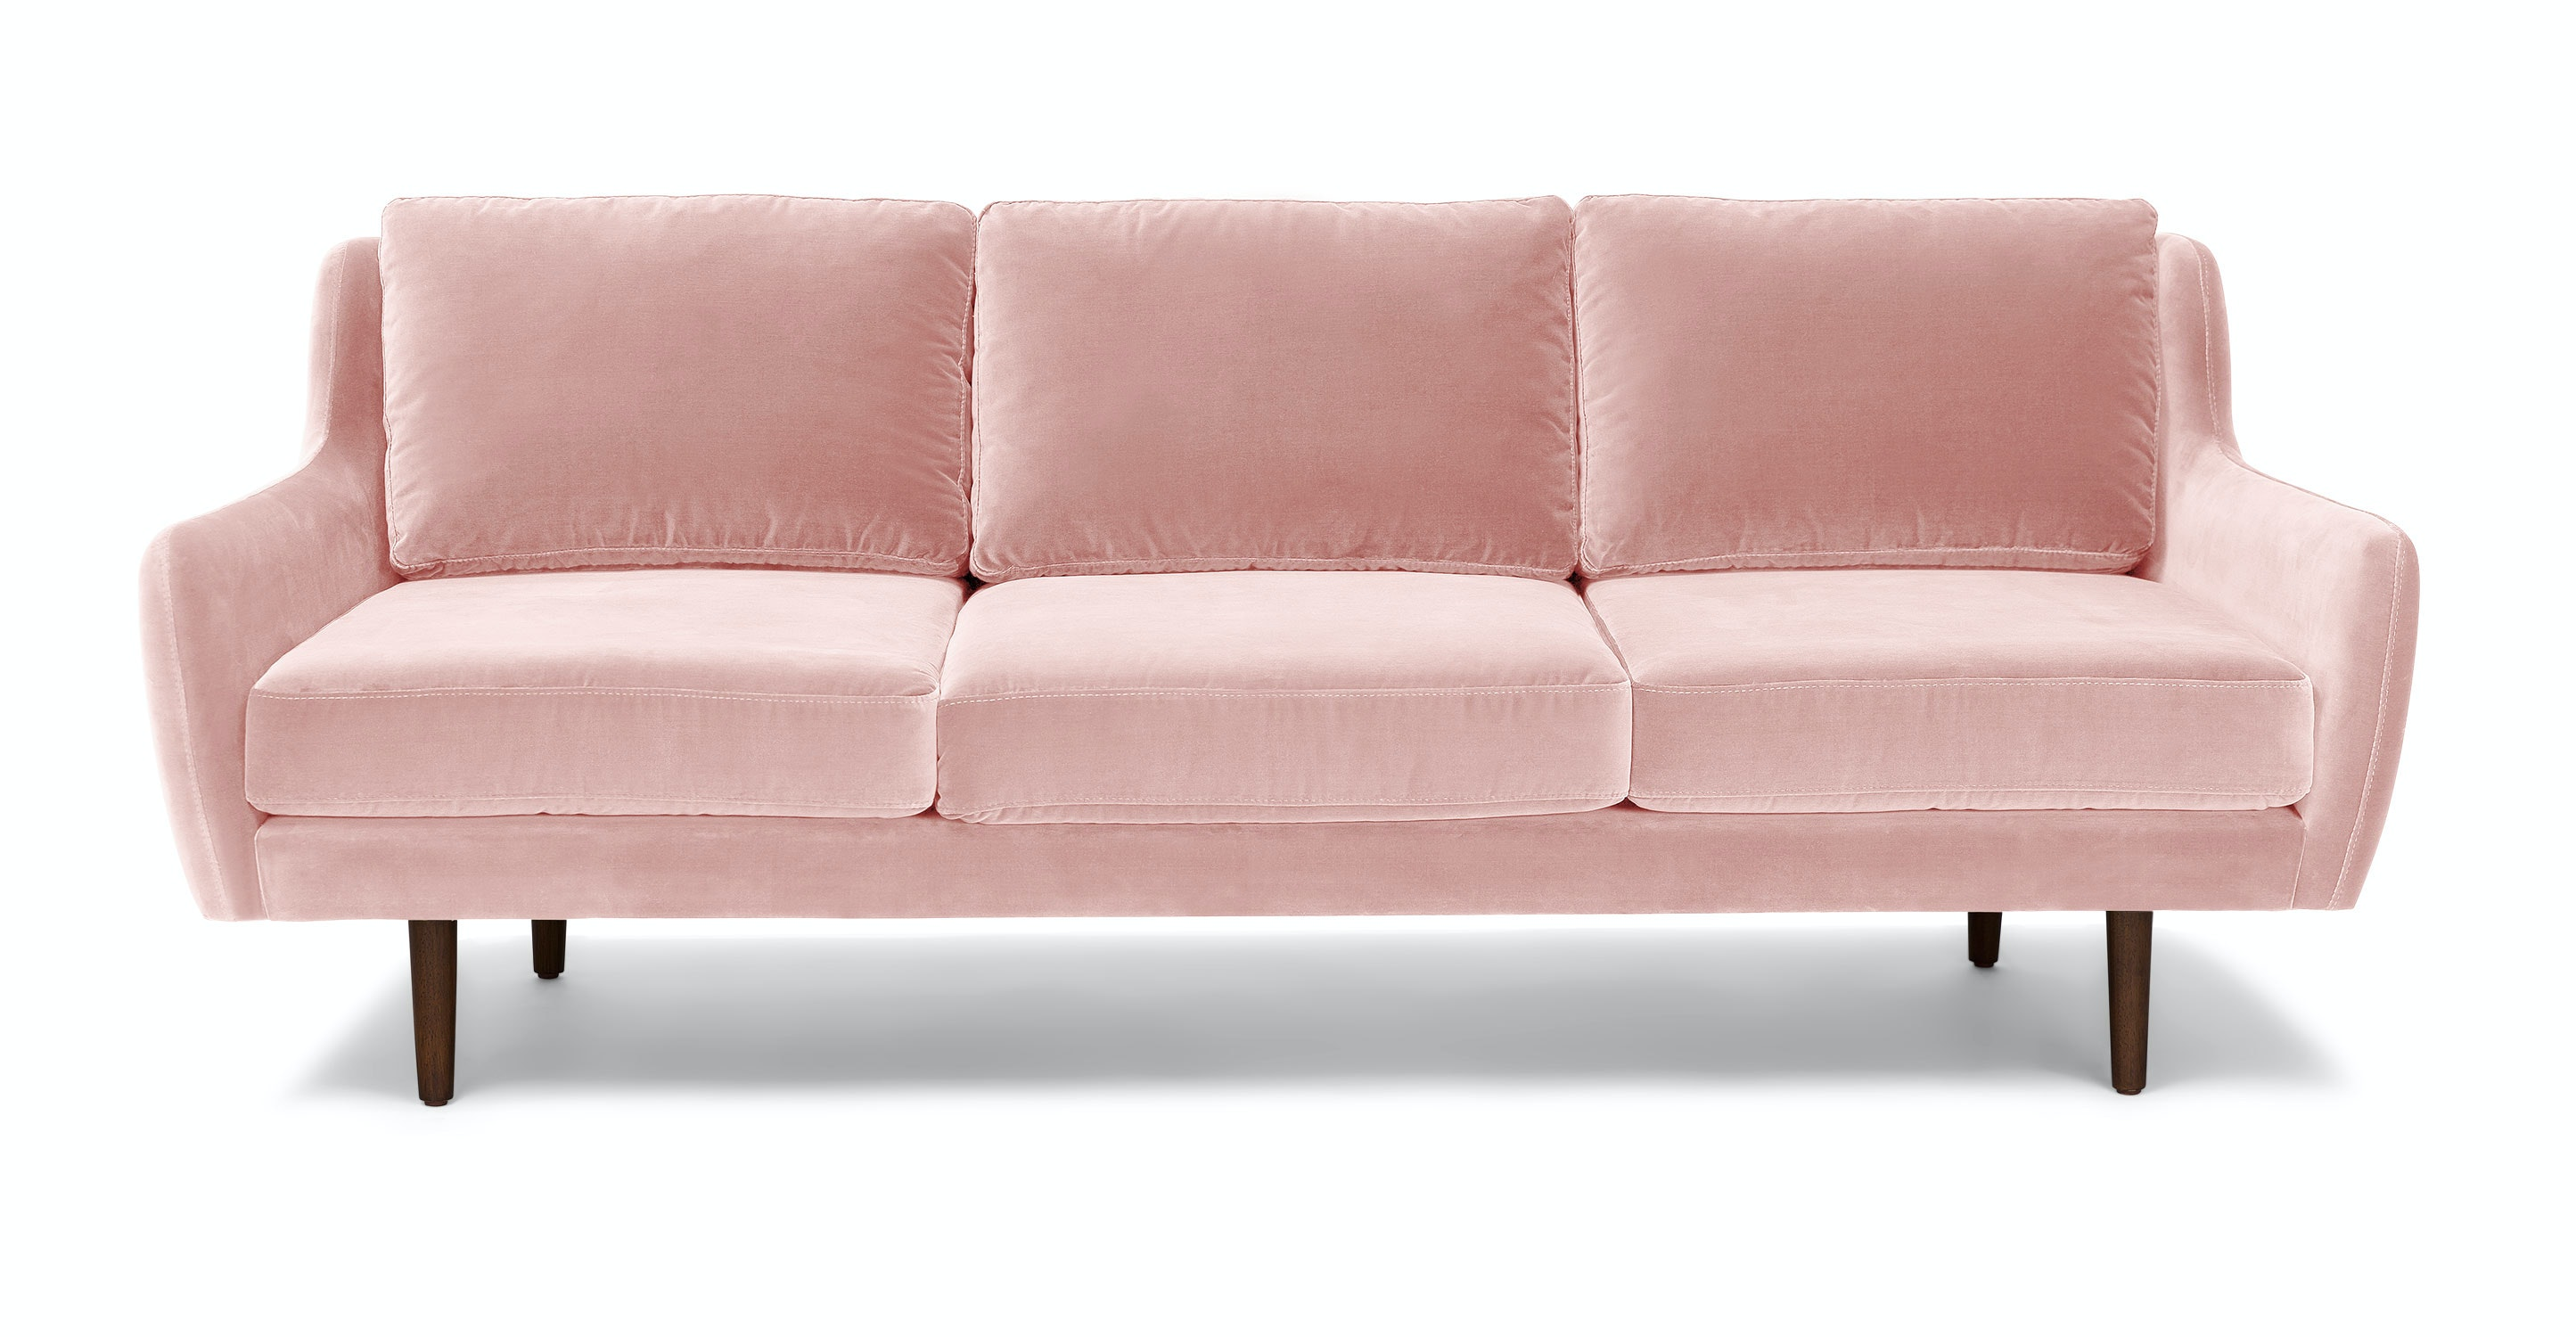 Charmant Matrix Blush Pink Sofa   Sofas   Article | Modern, Mid Century And  Scandinavian Furniture